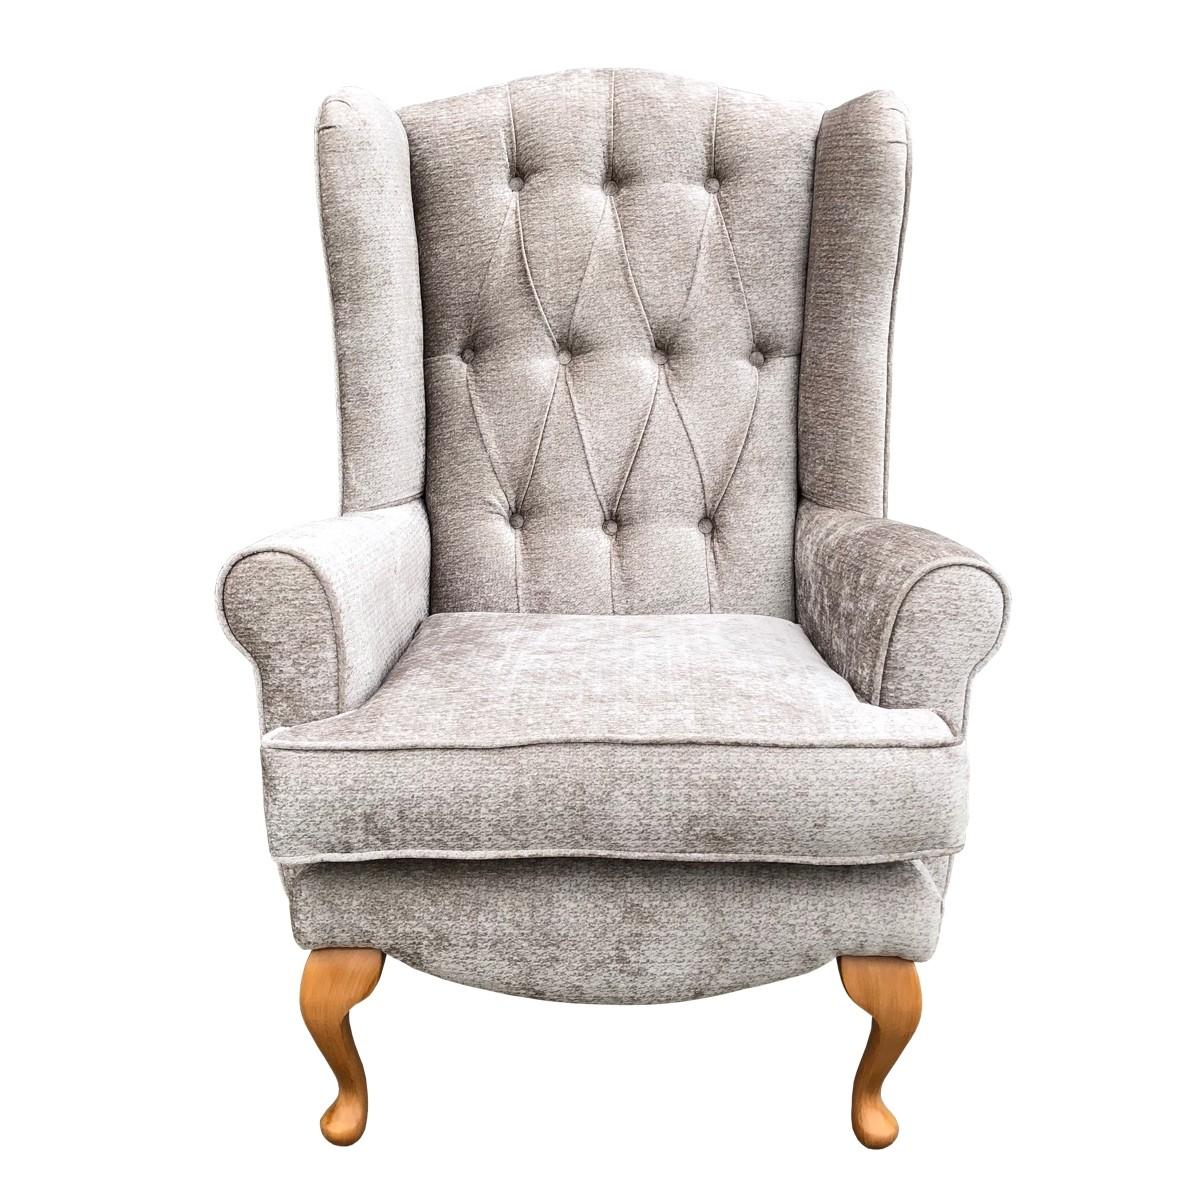 Deluxe Queen Anne Juno Caramel Wingback Chair